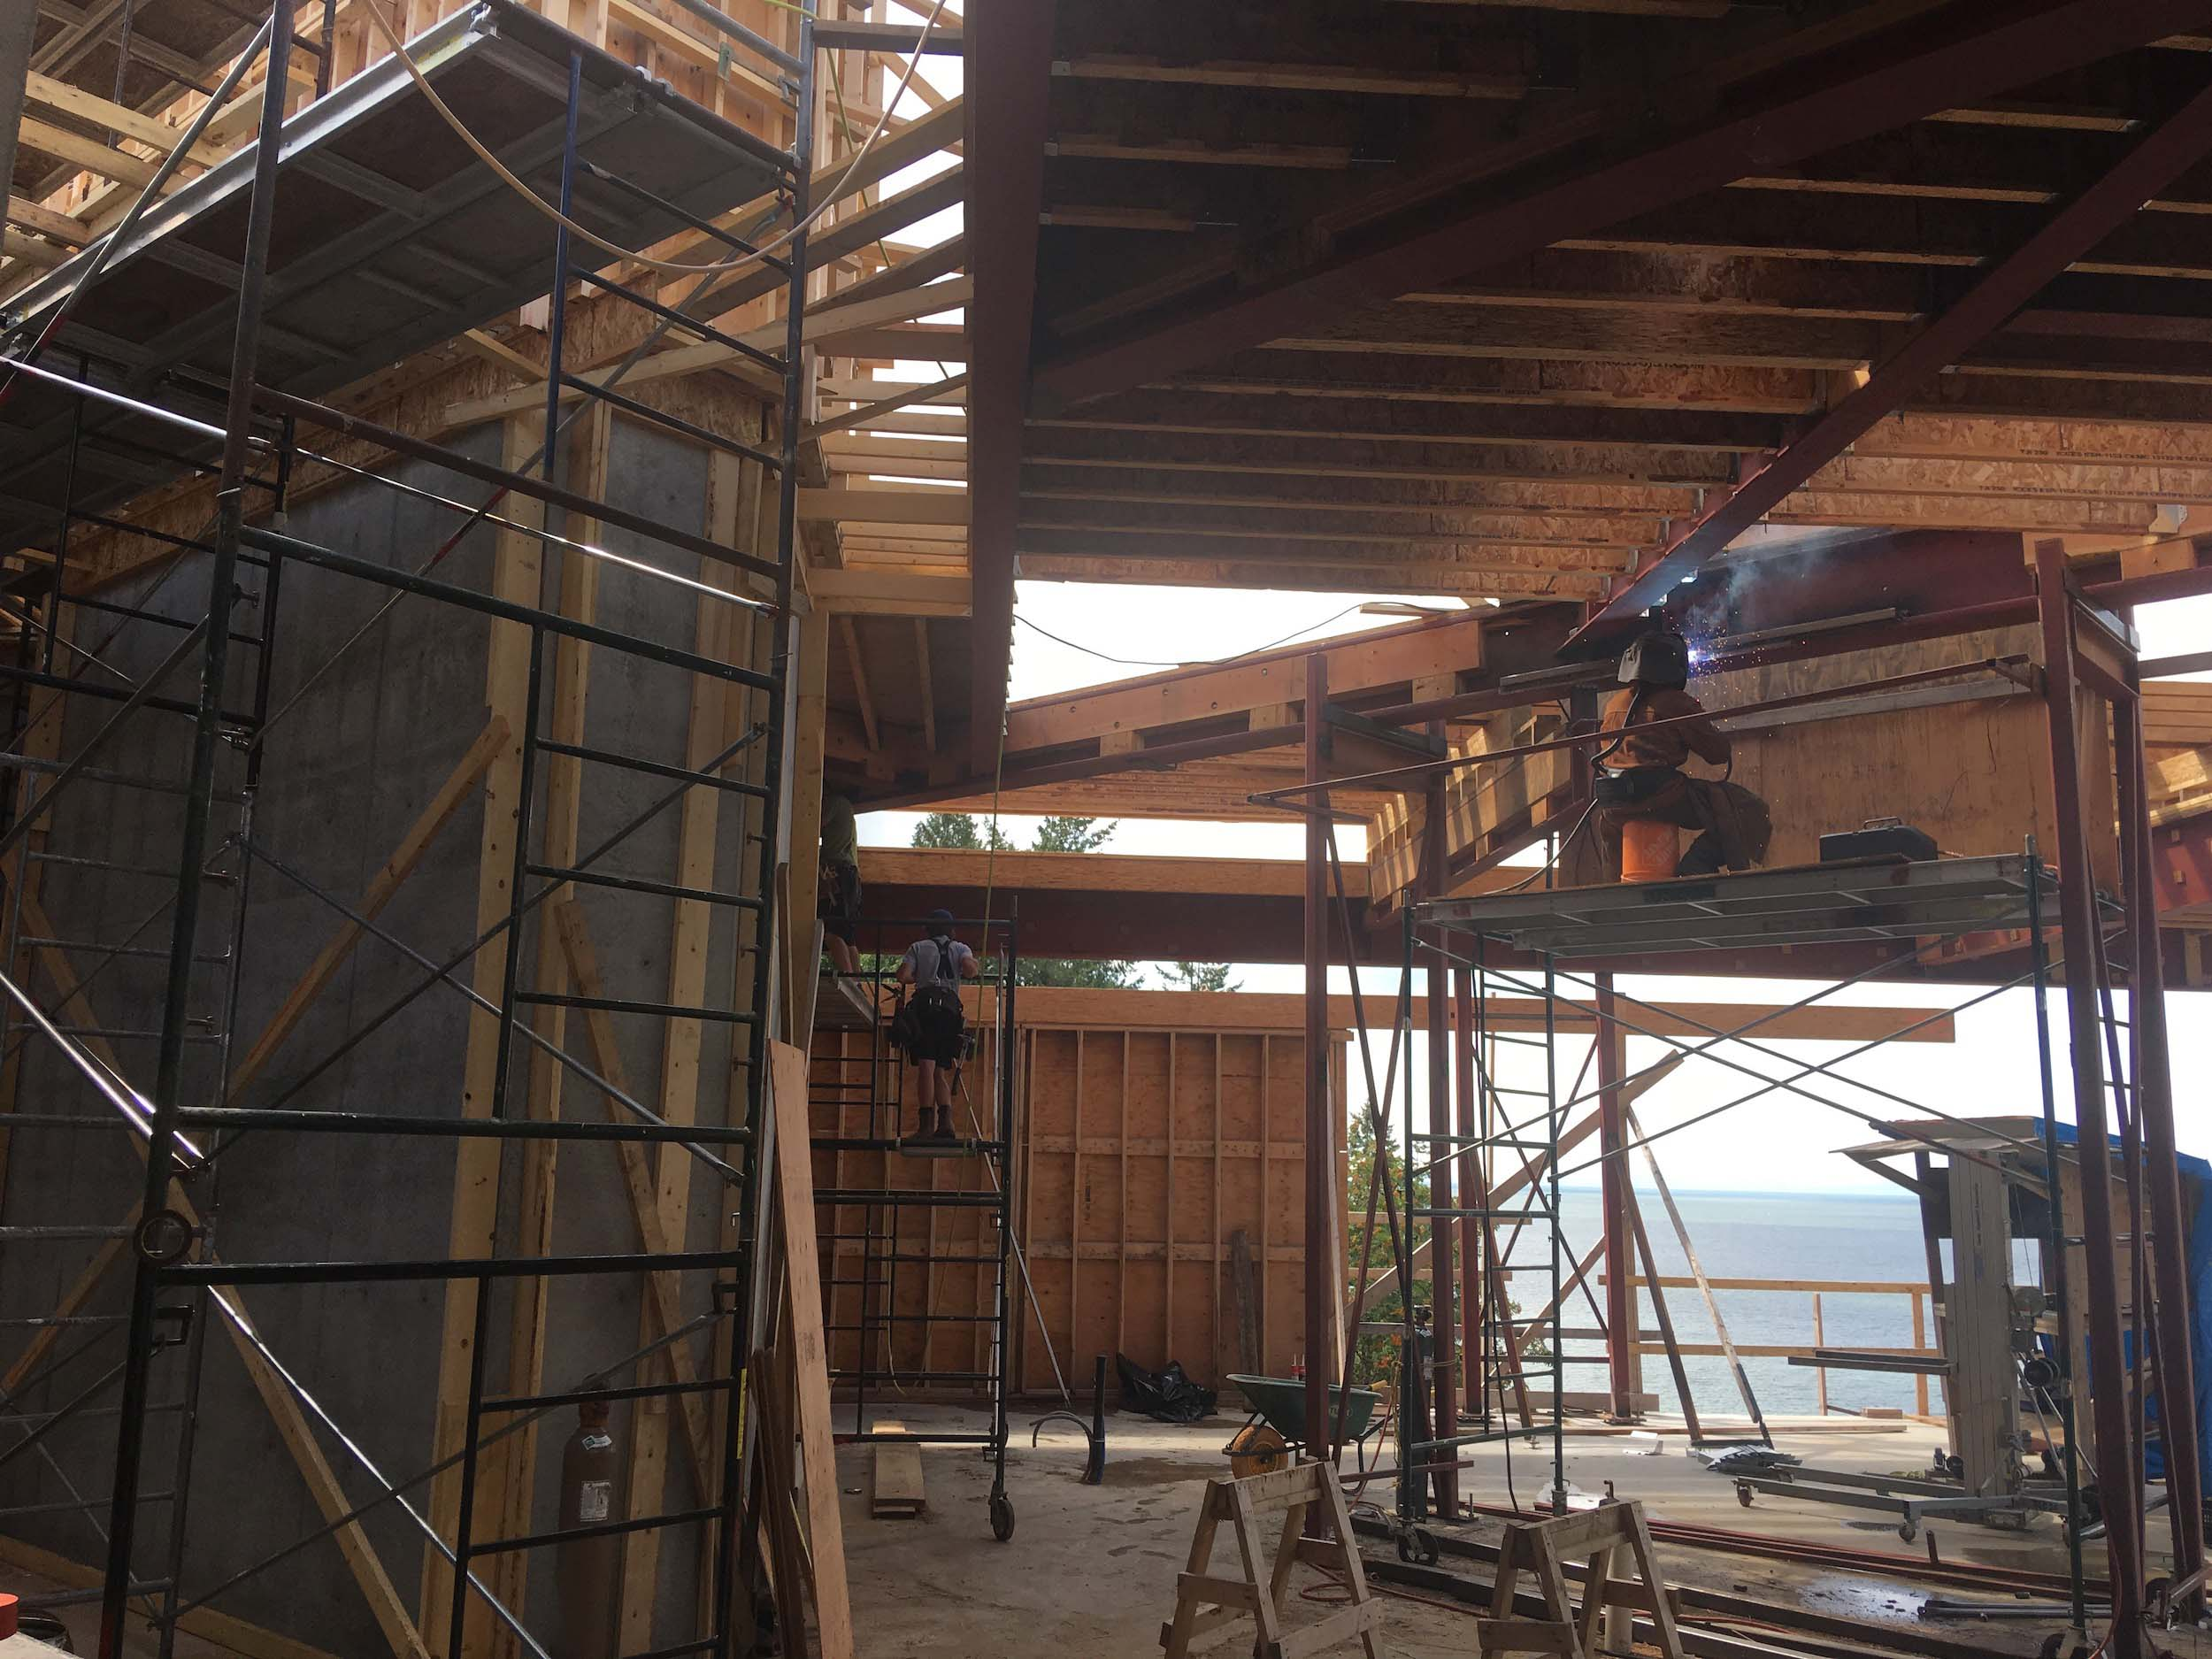 Postle_Construction_WoodFraming15.jpg